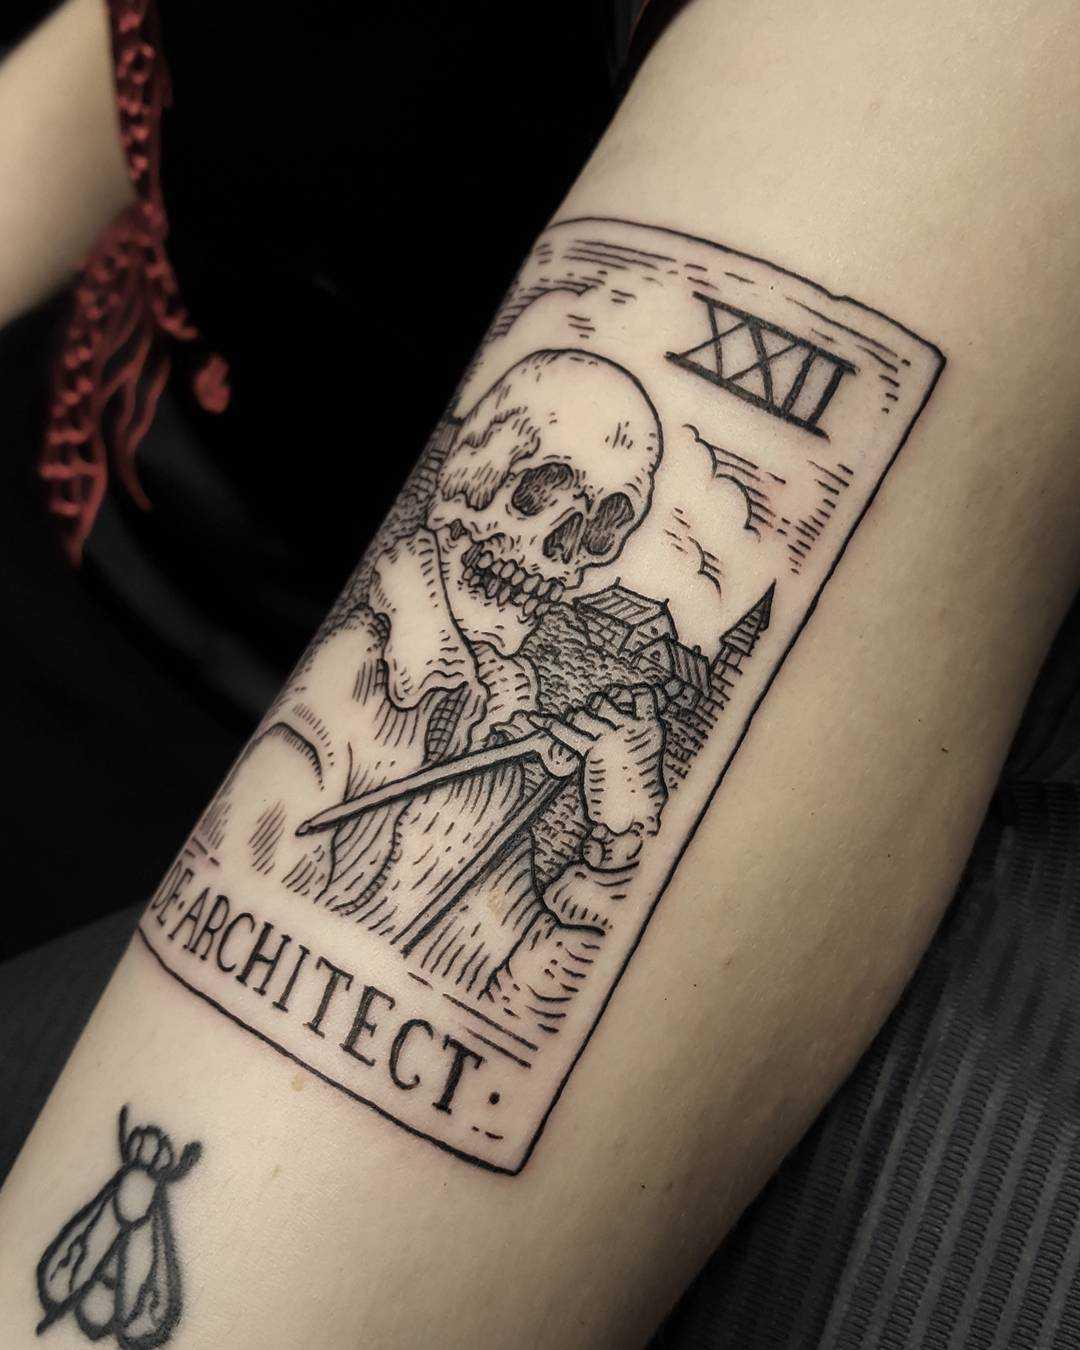 XXII De Architect tattoo